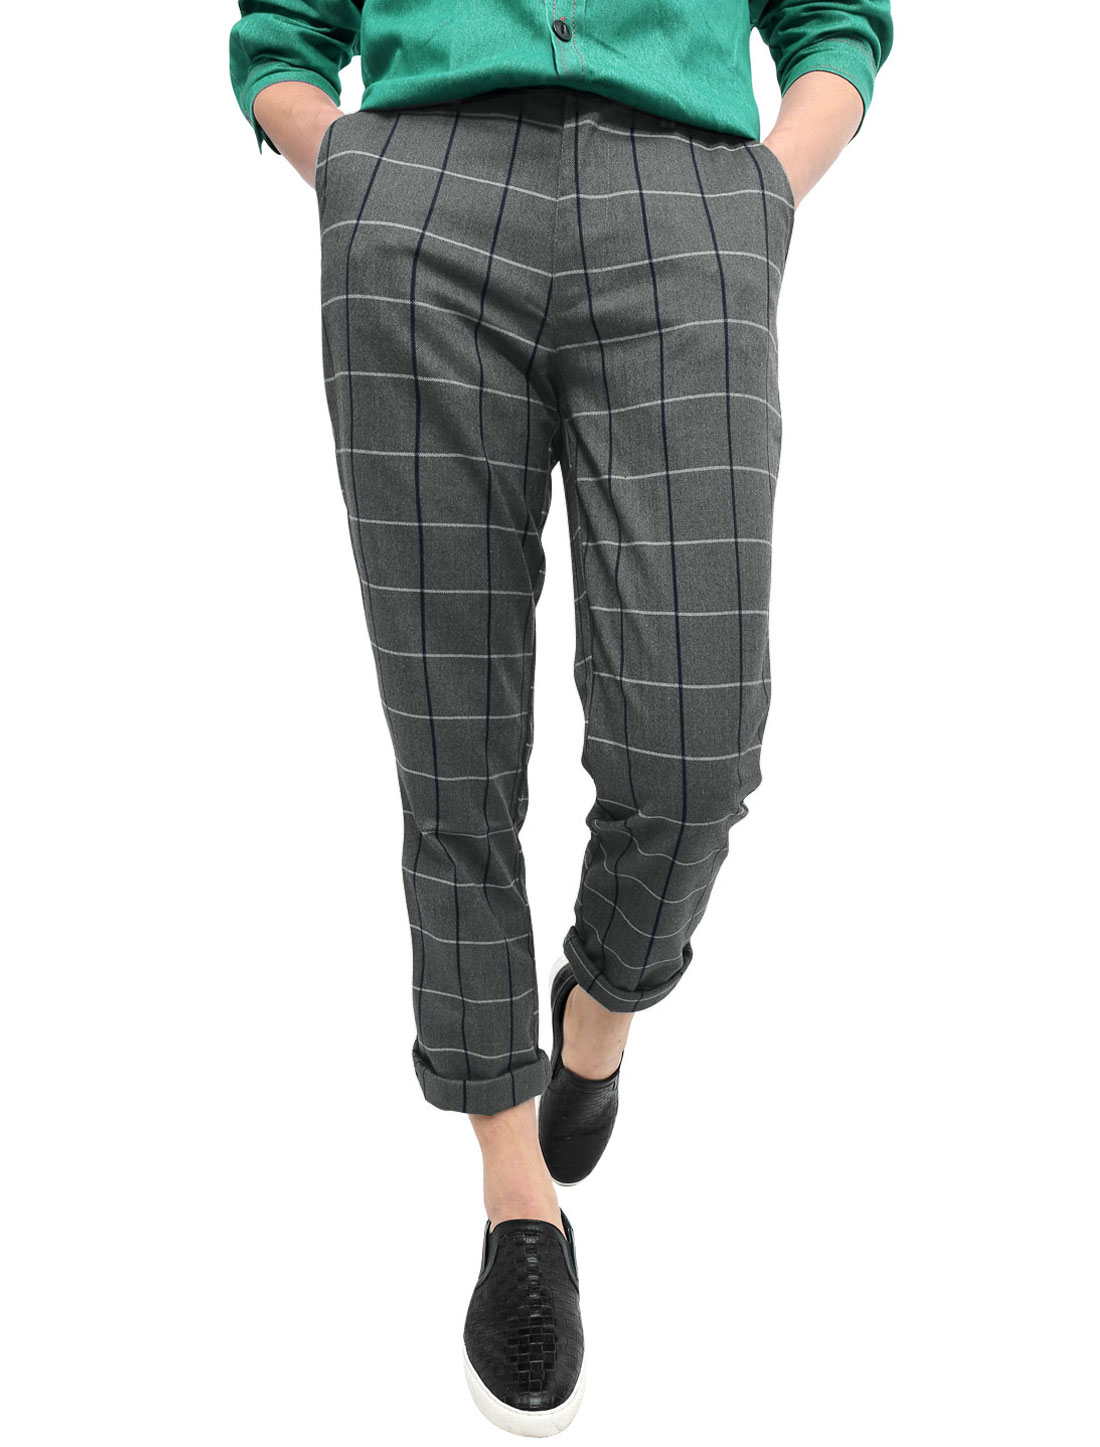 Men Mid Rise Checks Print Front Pockets Slim Fit Casual Pants Dark Gray W28